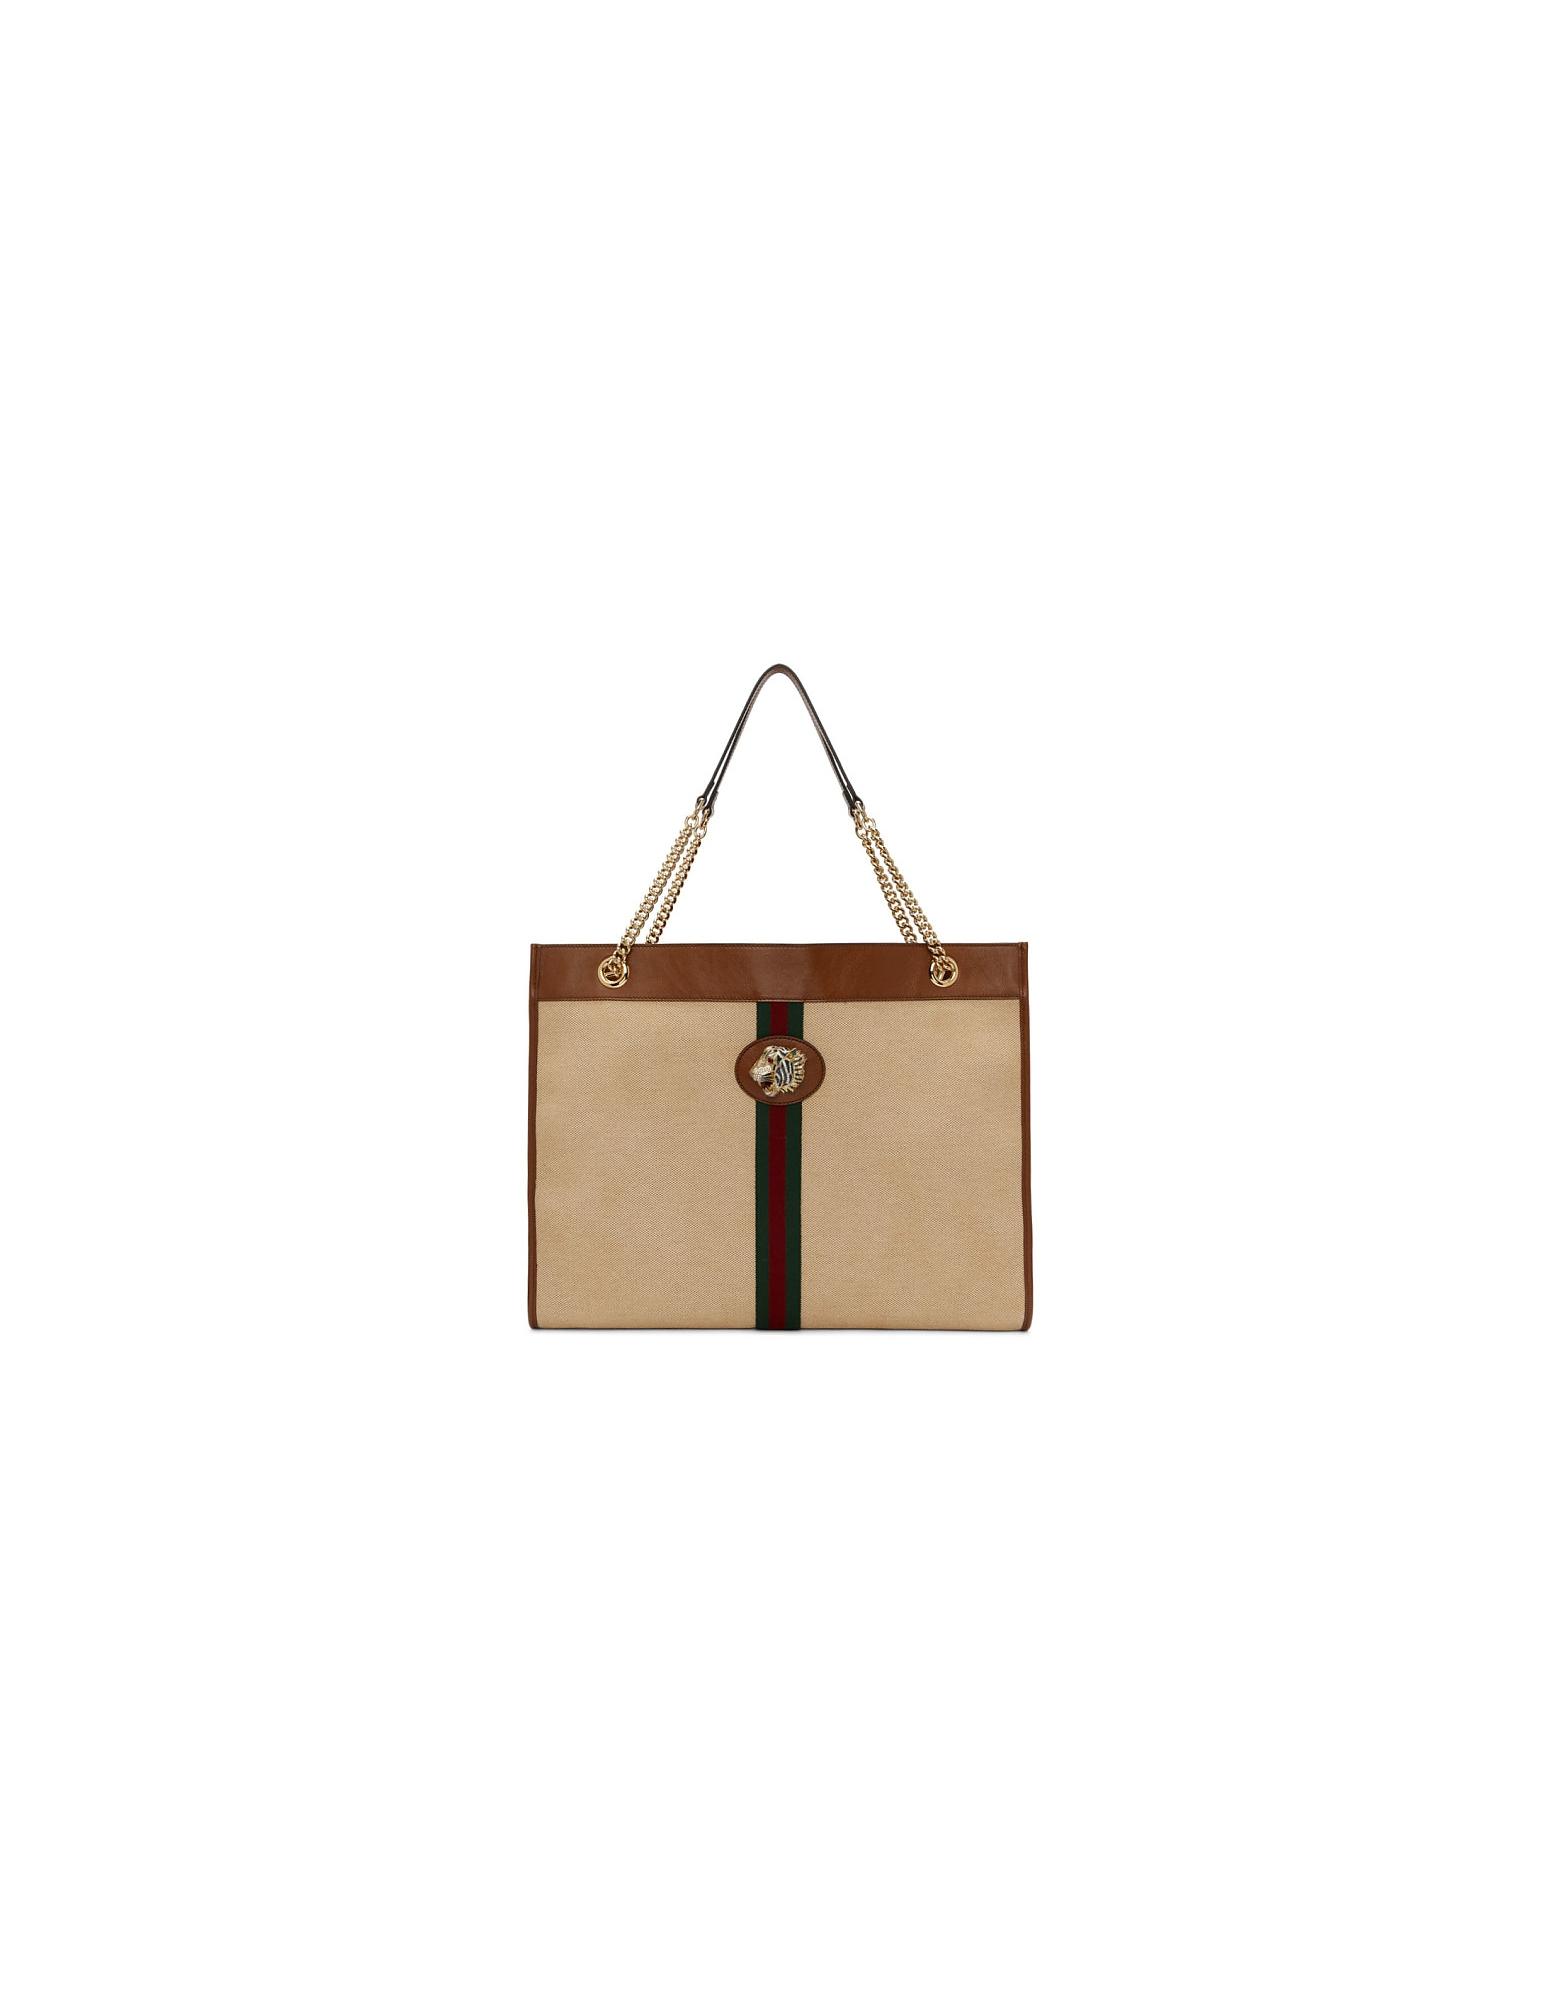 Gucci Designer Handbags, Beige Large Rajah Tote